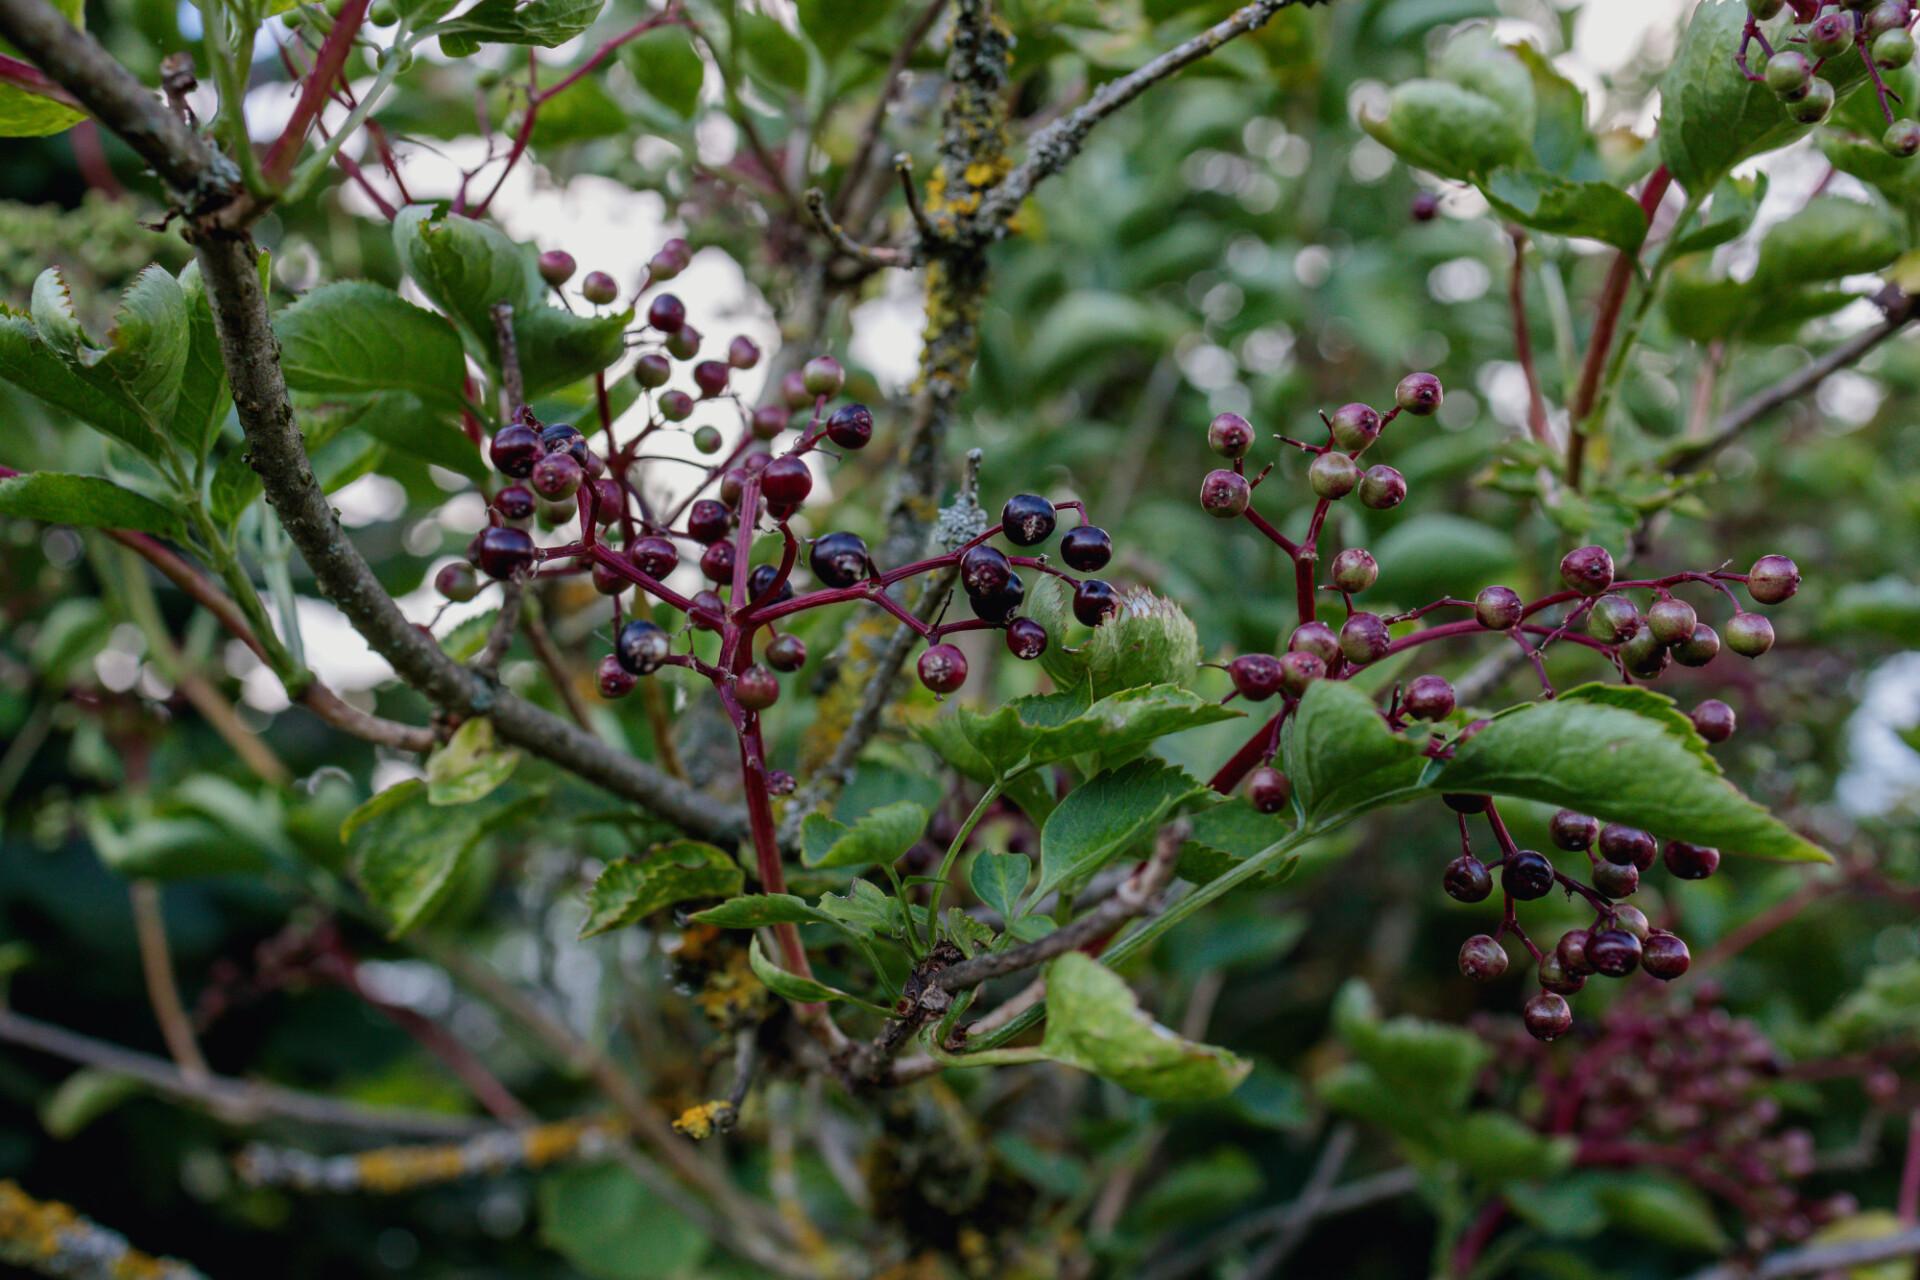 Elderberry just before ripening